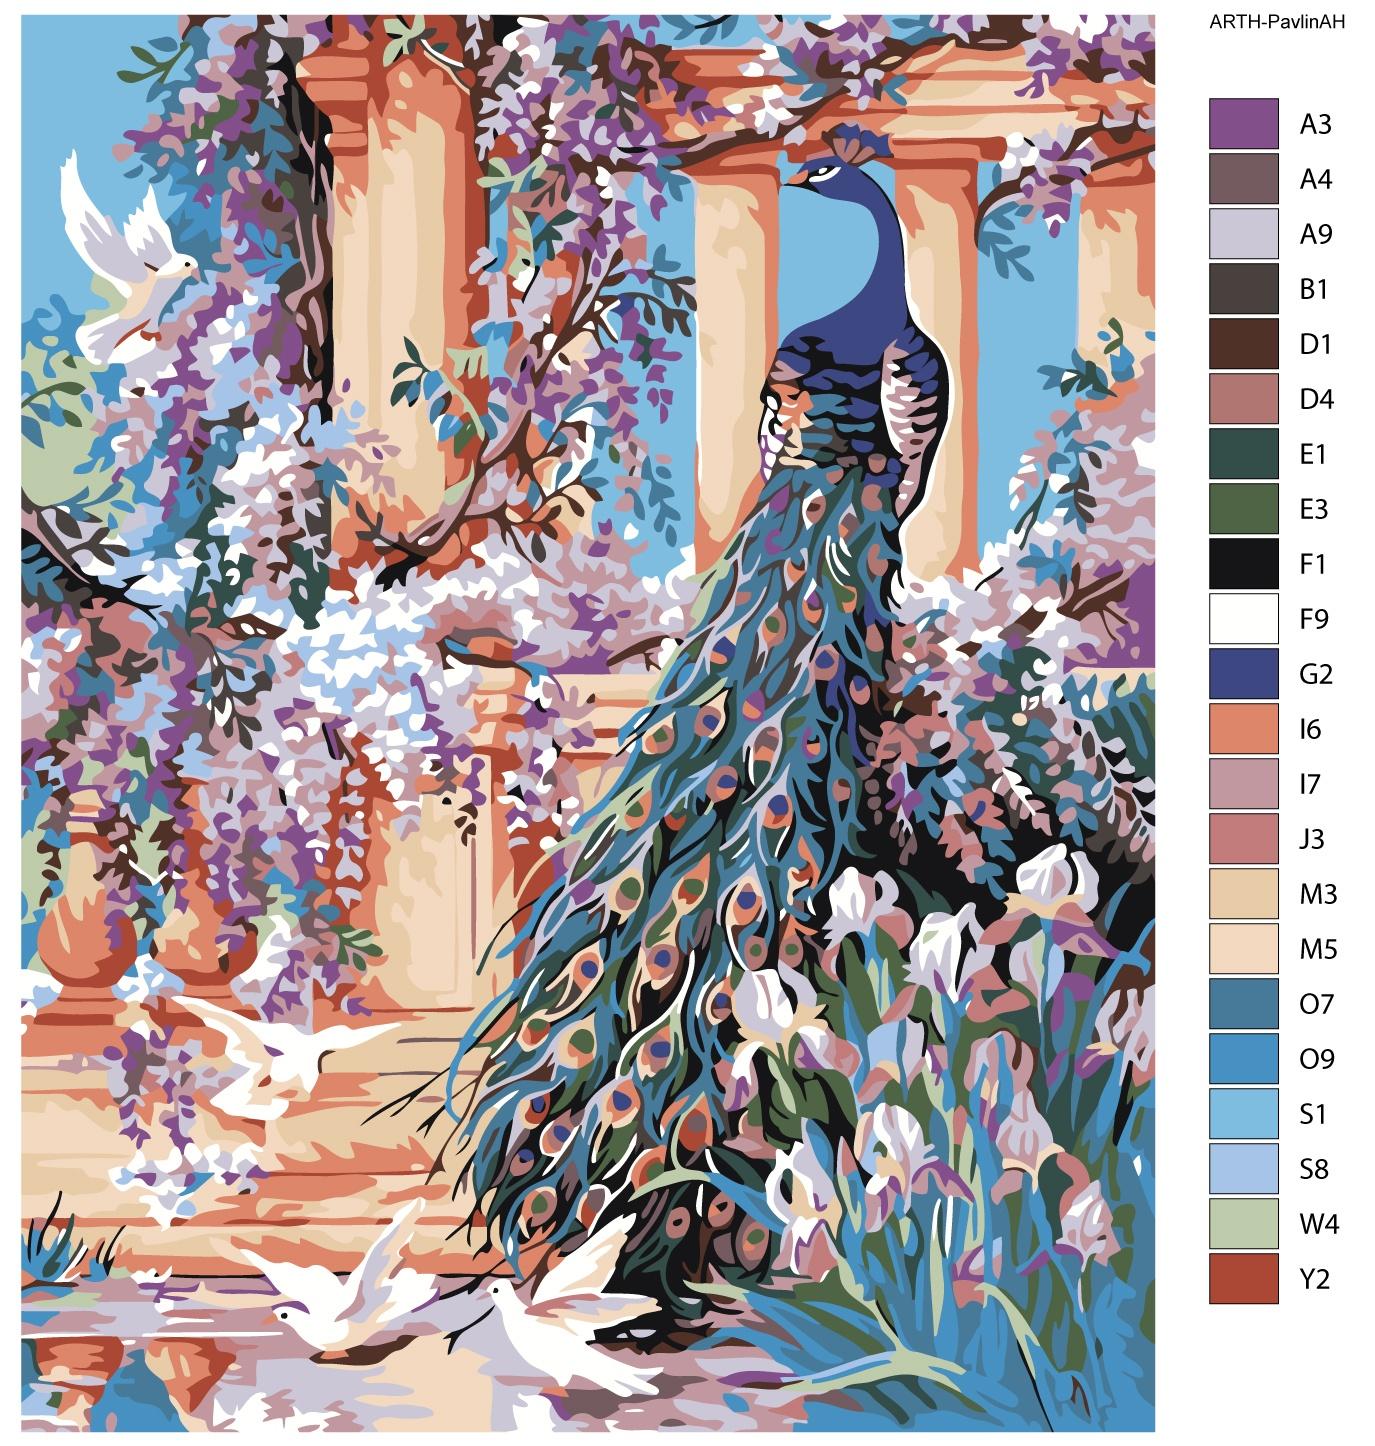 Картина по номерам, 80 x 100 см, ARTH-PavlinAH